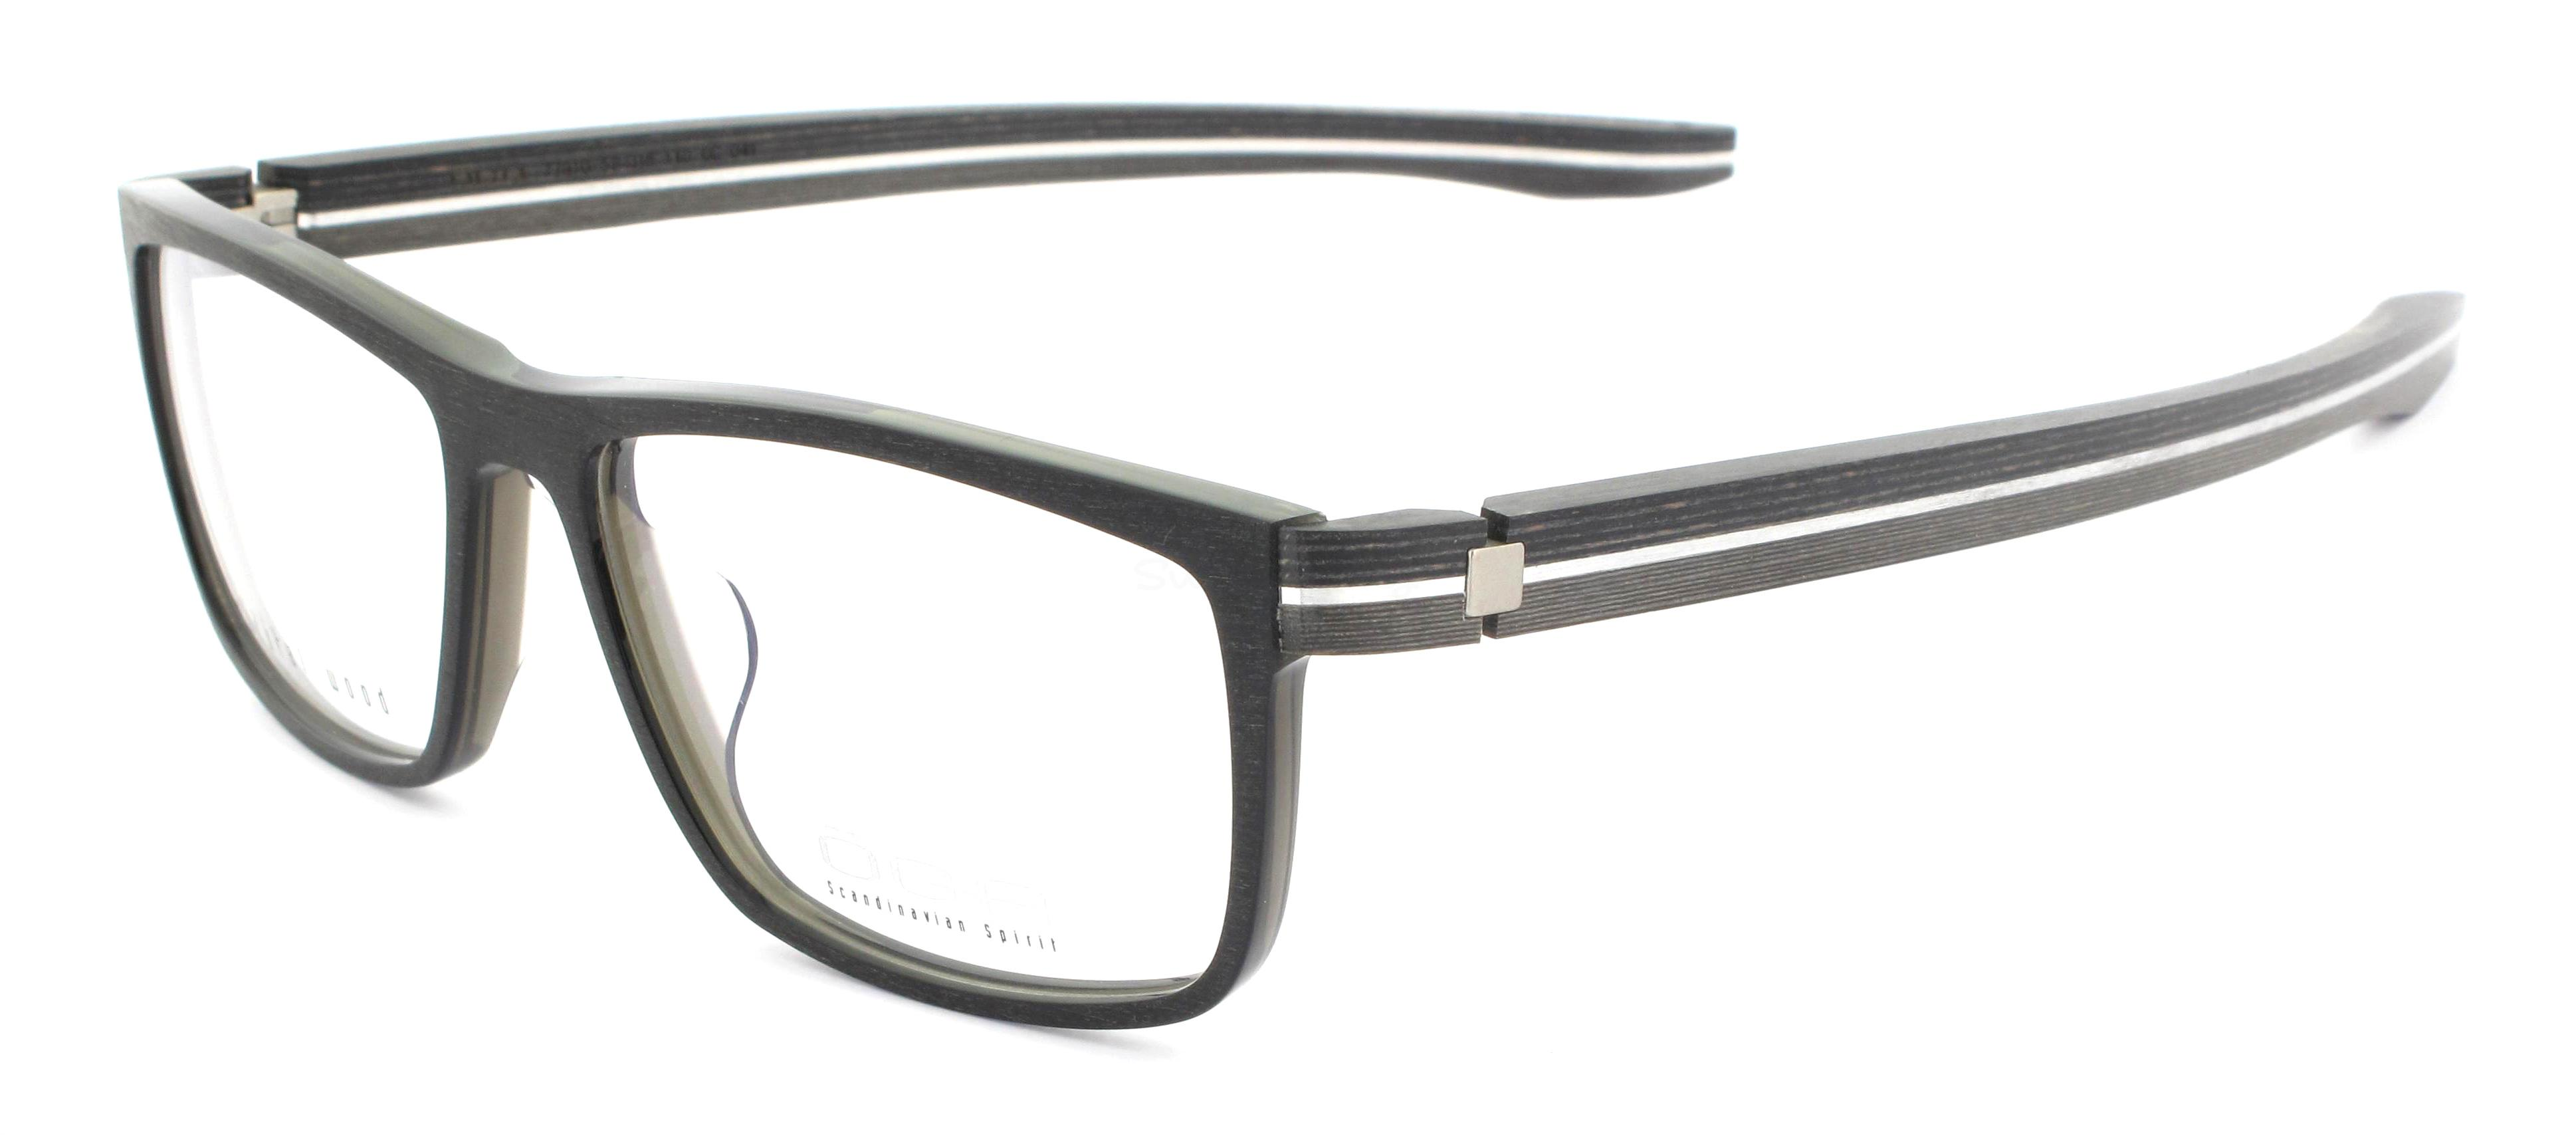 GG041 7791O PILTRA (WOOD) Glasses, ÖGA Scandinavian Spirit